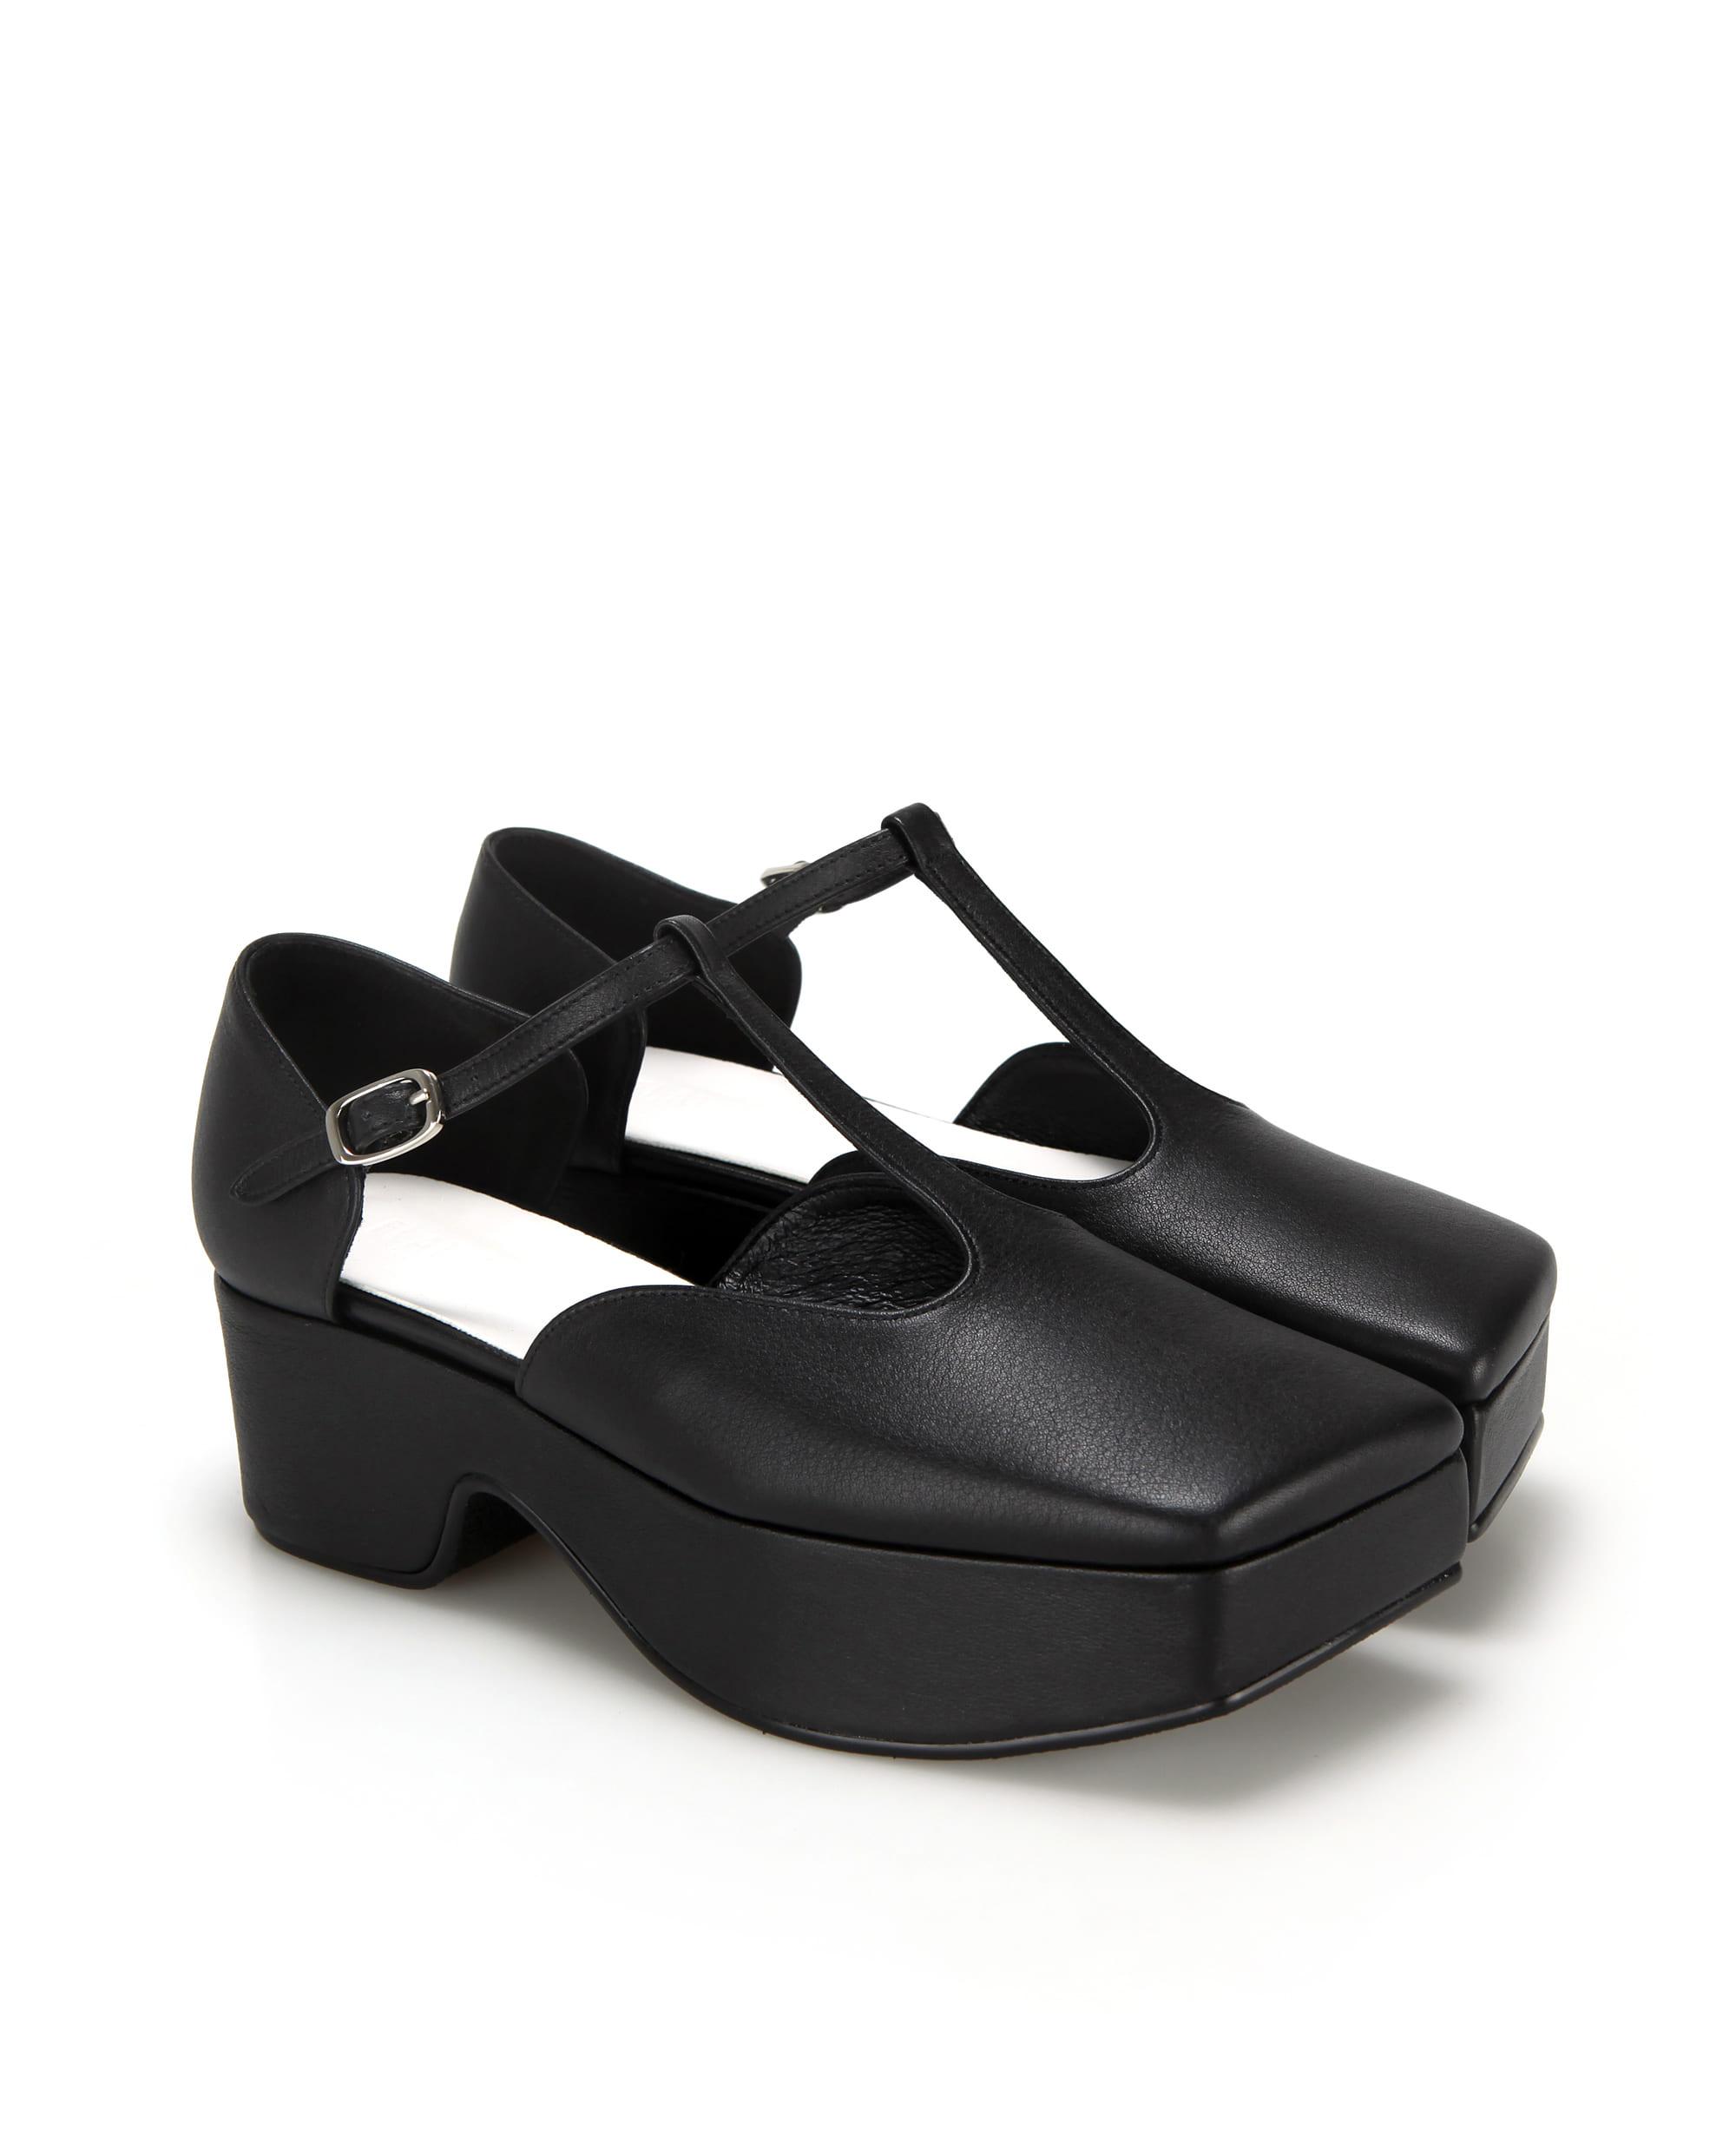 Squared toe T-strap mary jane platforms | Black